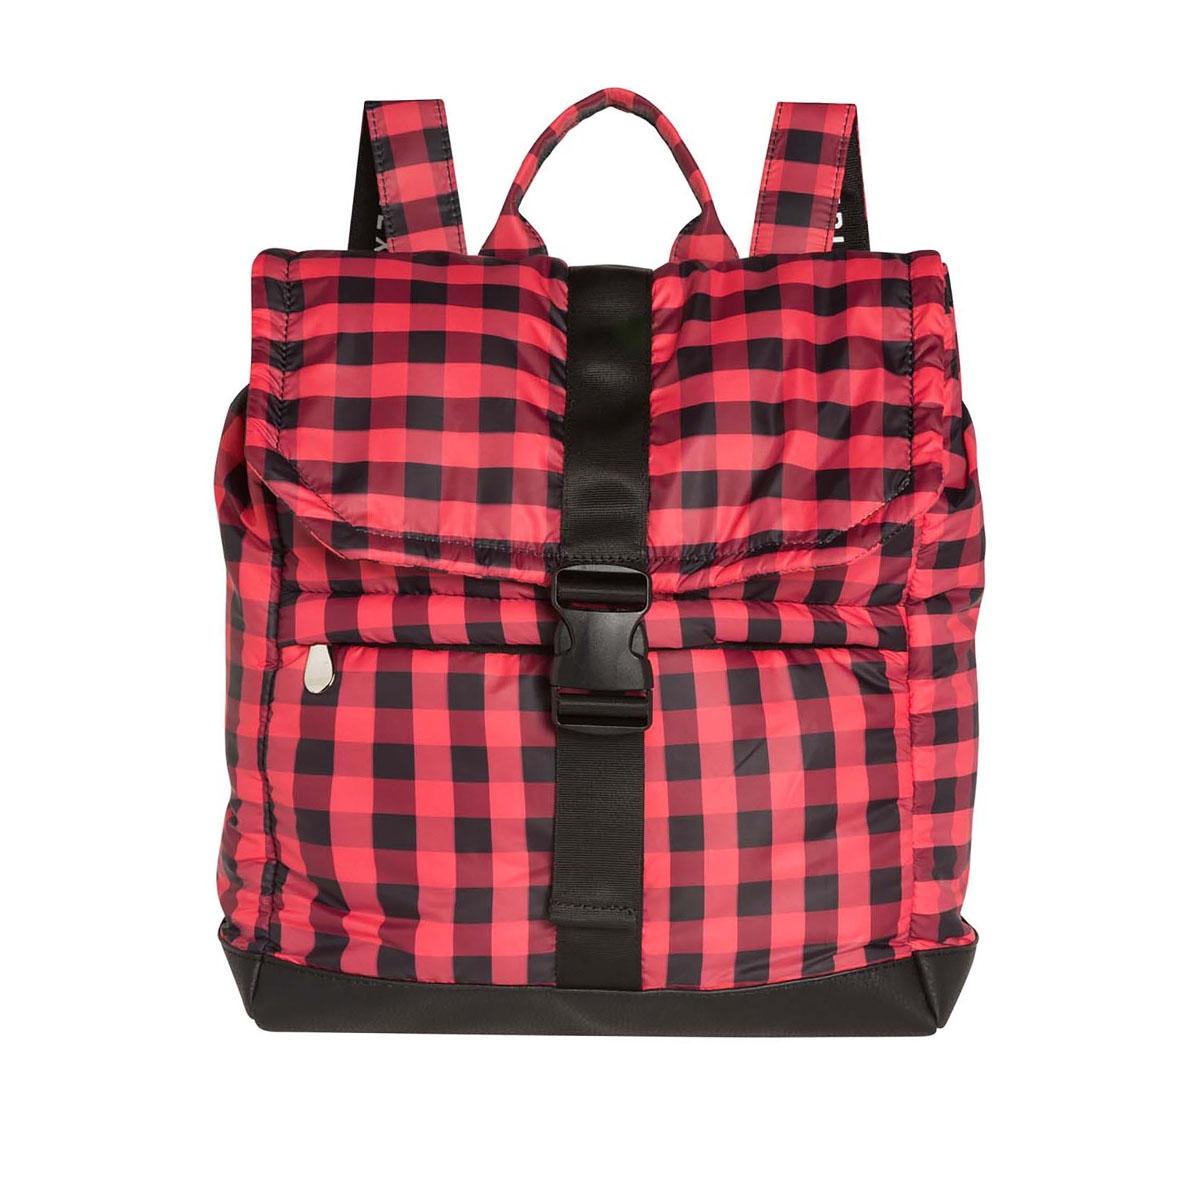 backpack puffy nylon 20 959 8103 10 days tas fluor red